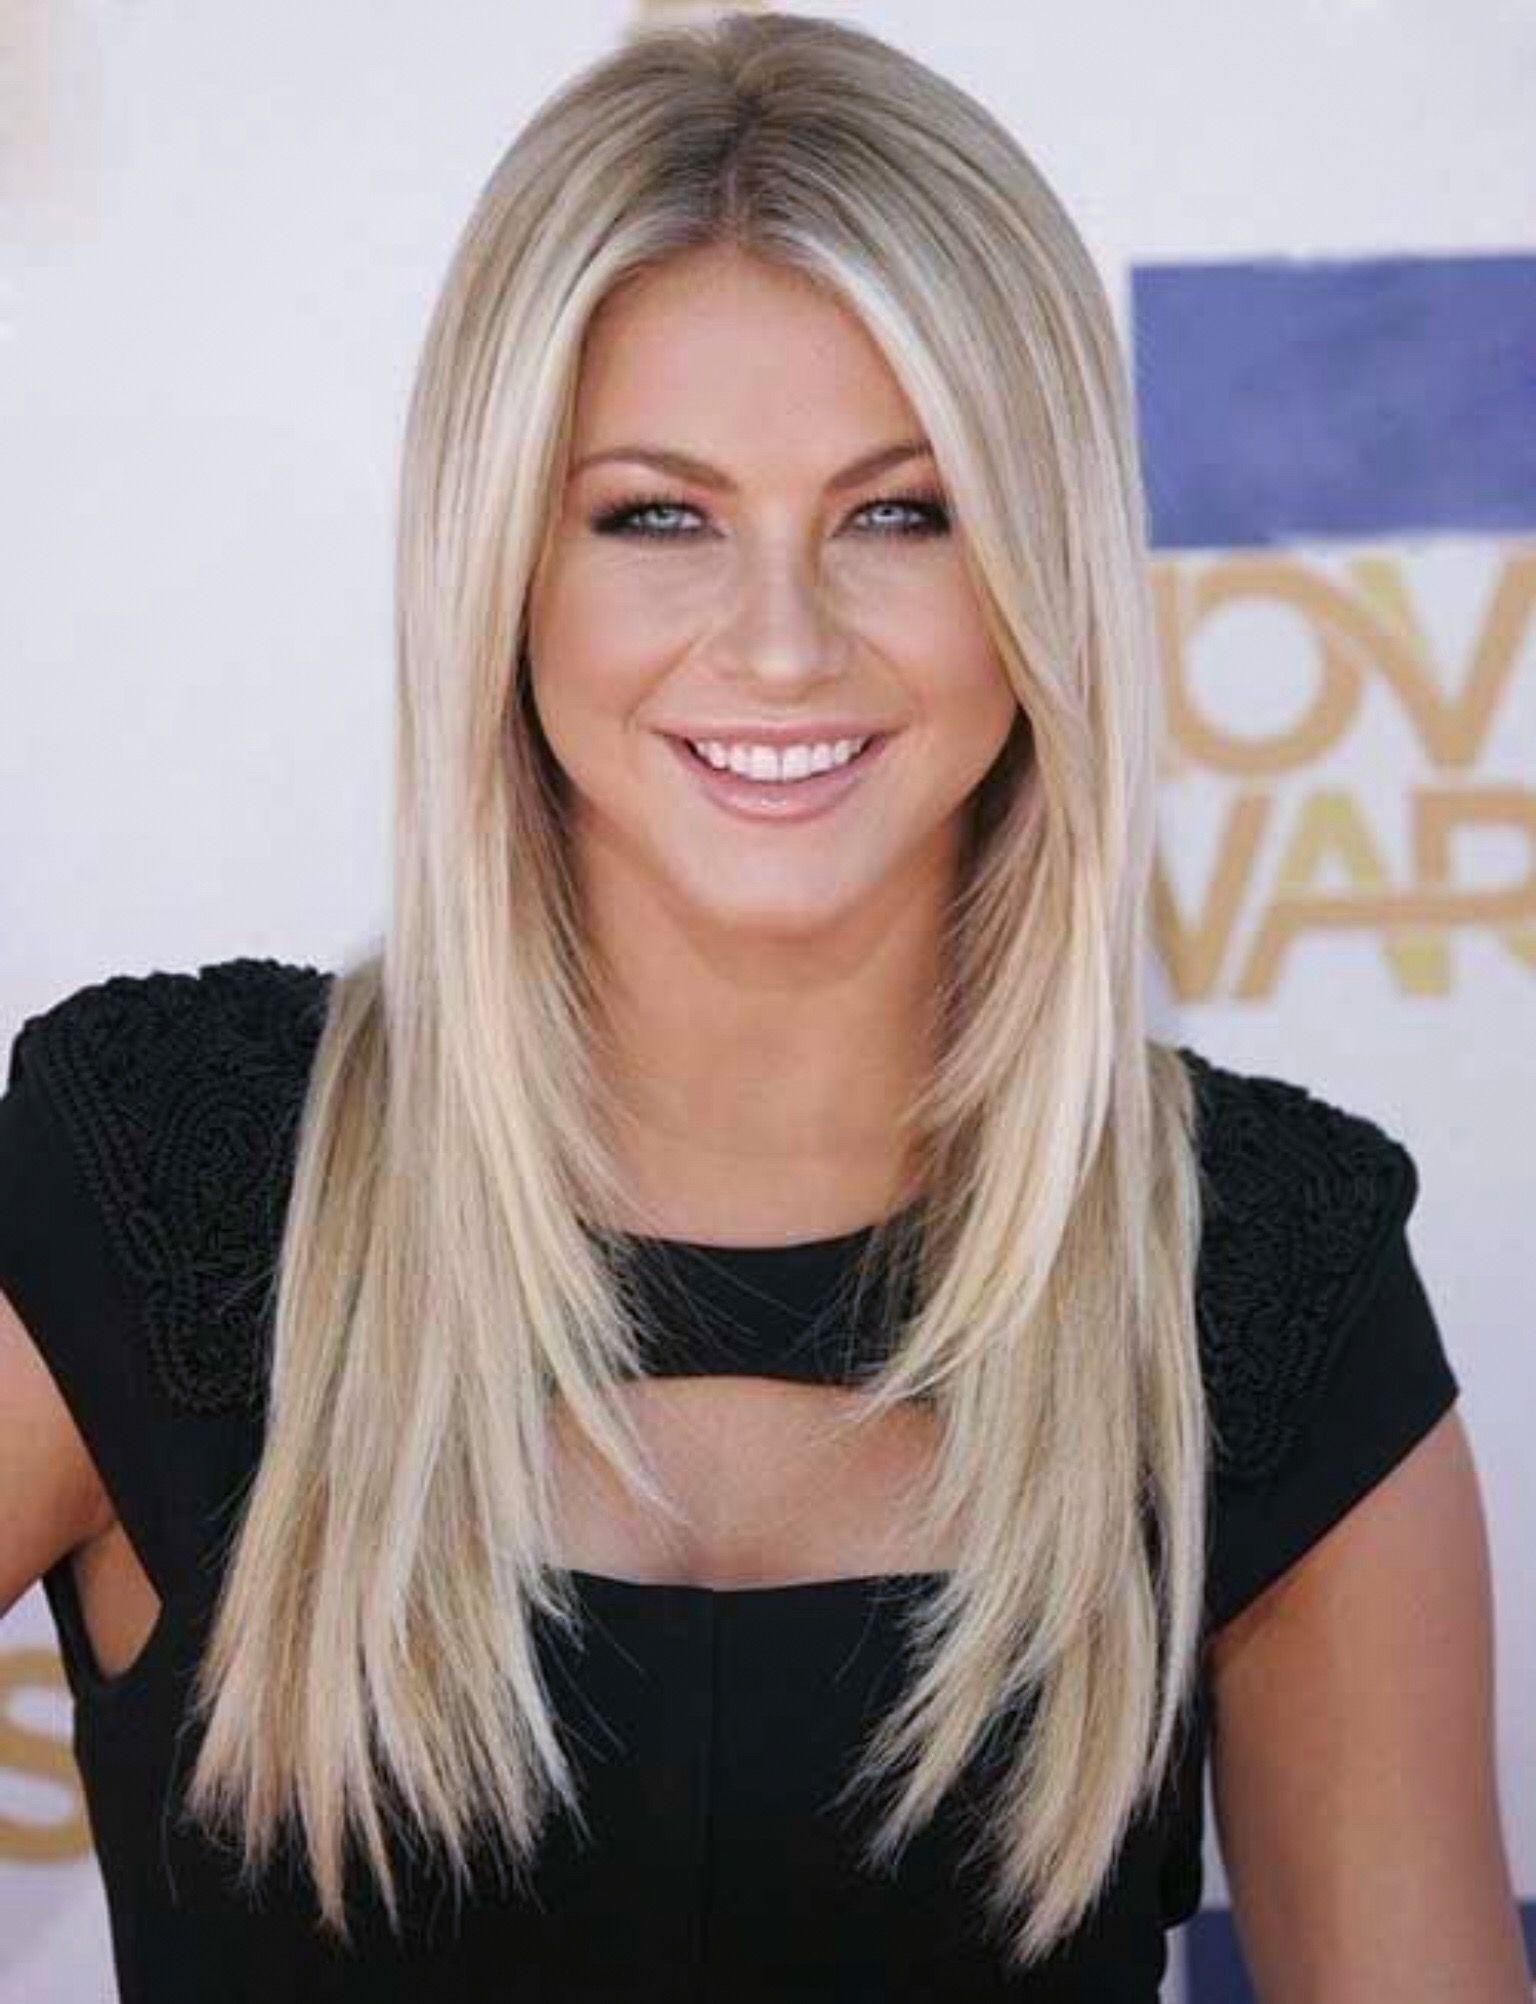 Love The Face Framing Long Hair Styles Julianne Hough Long Hair Hair Styles